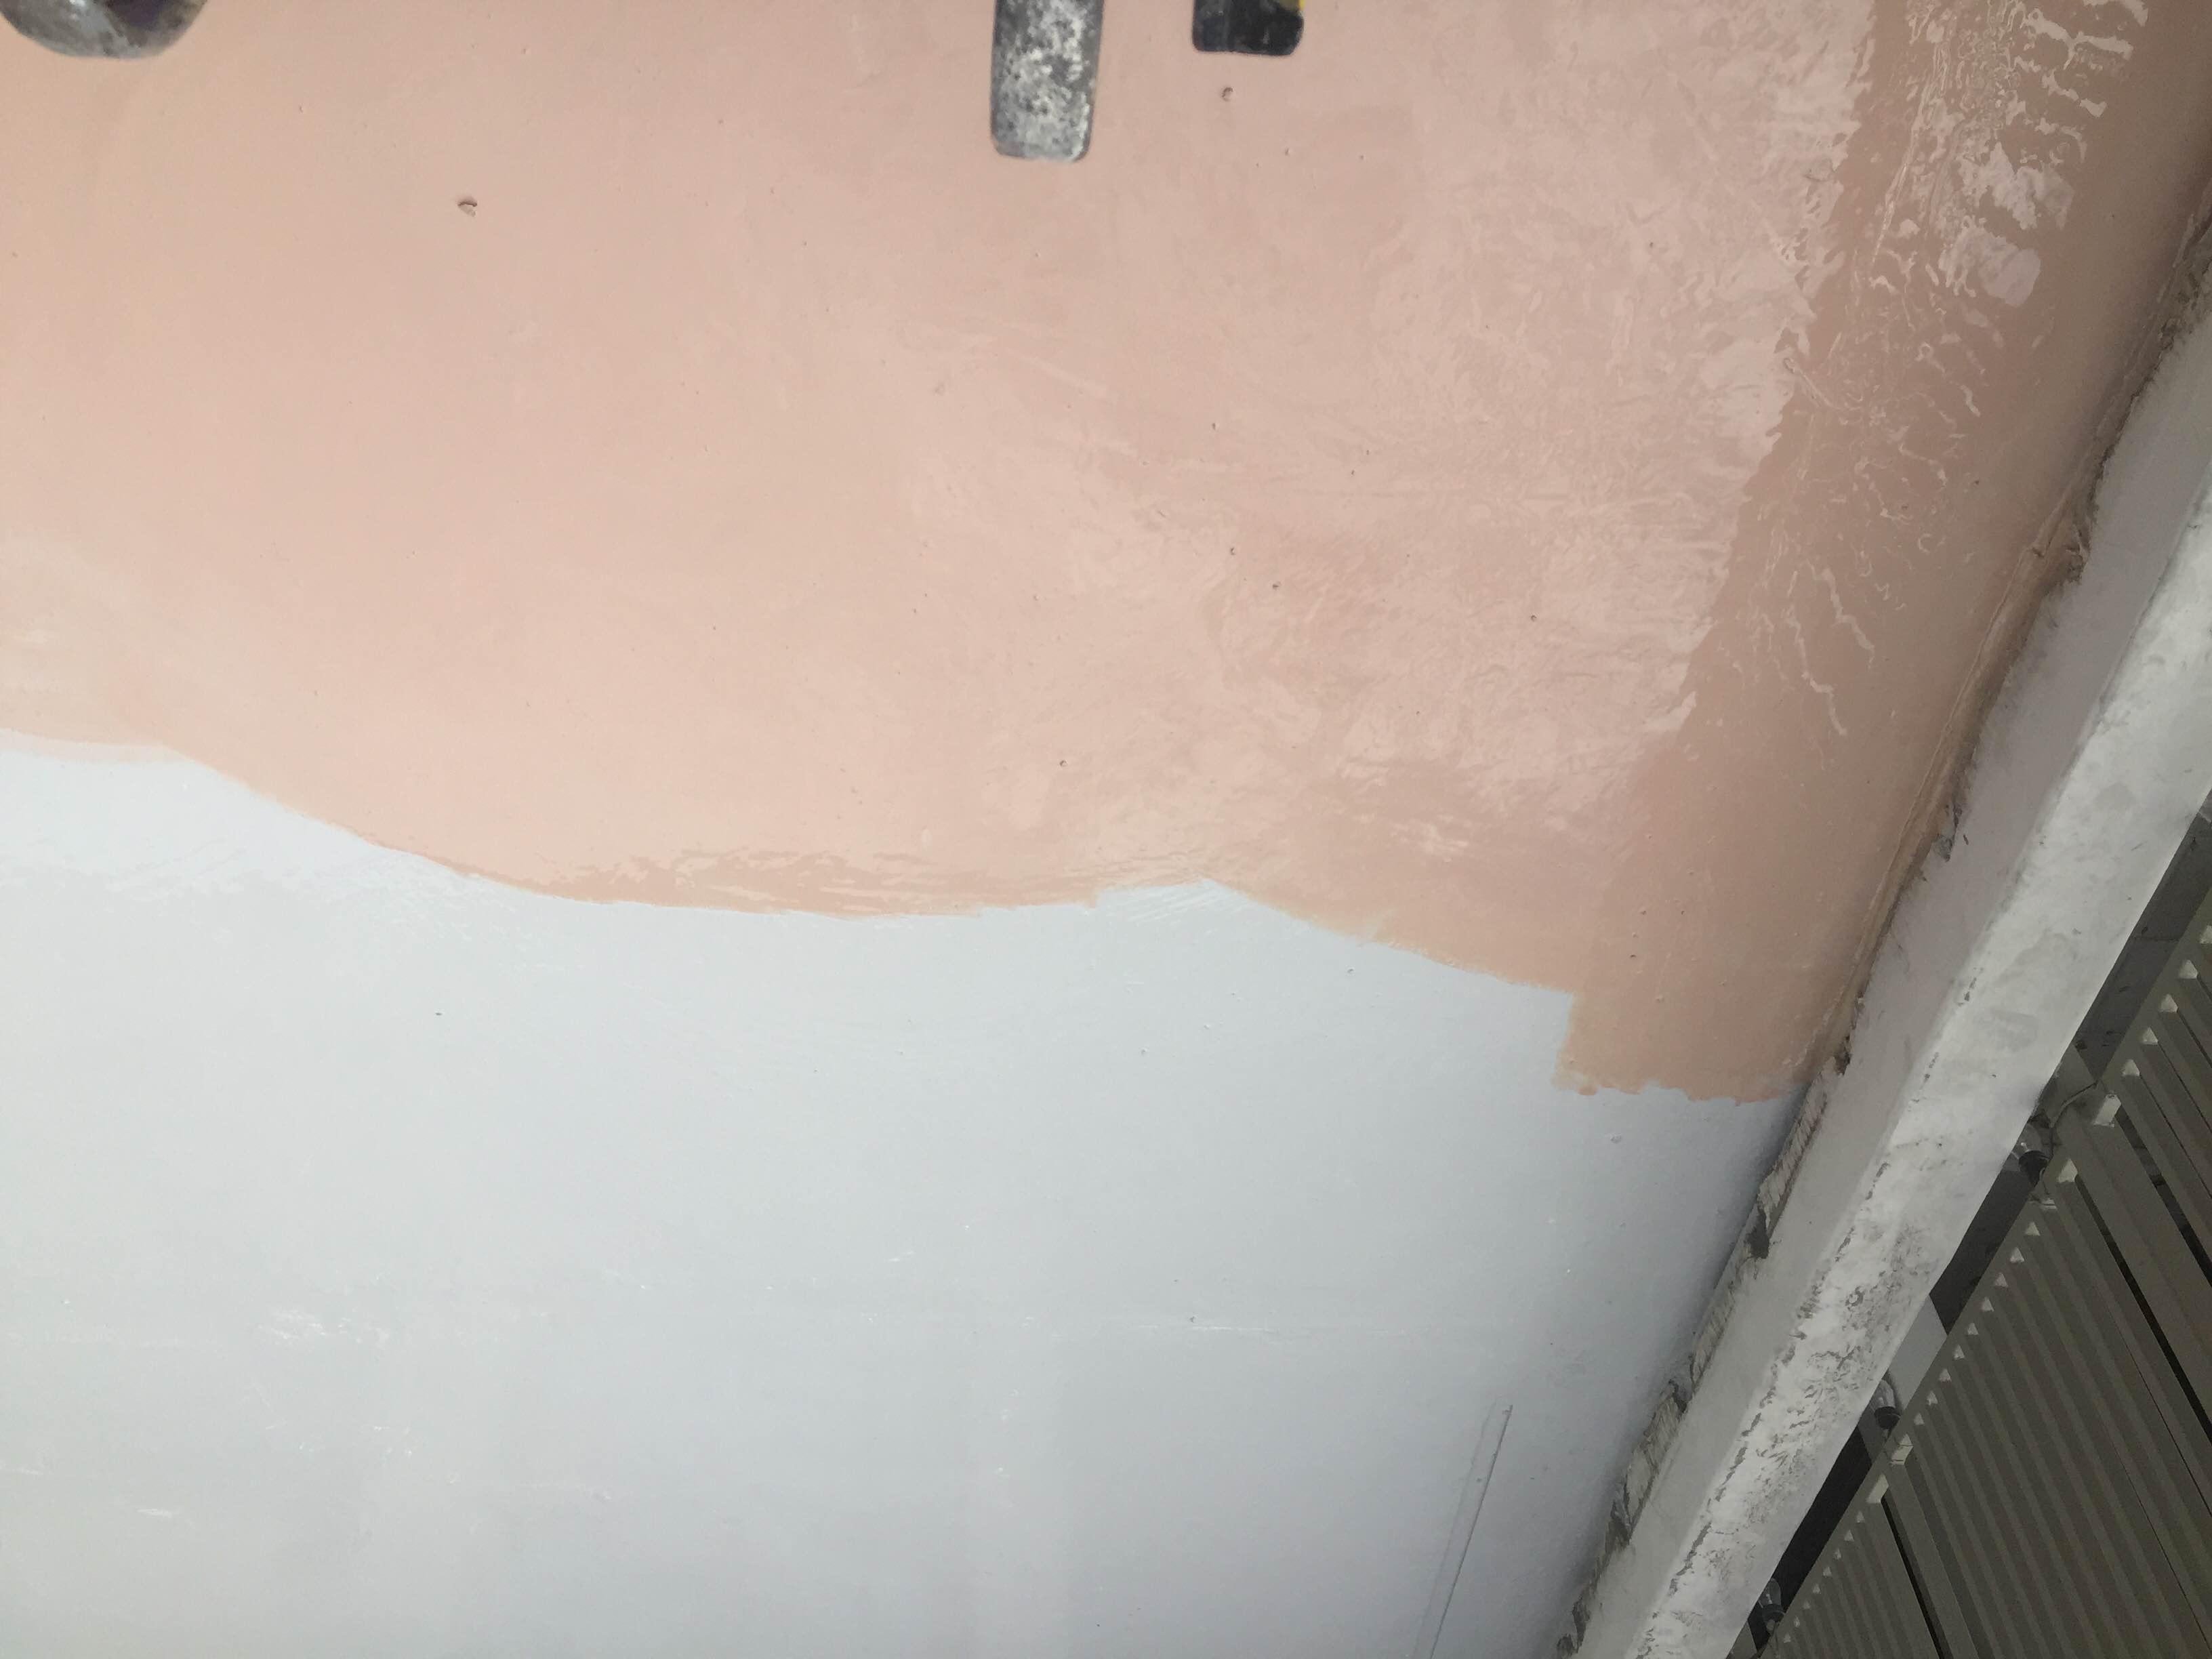 waterproofing coating work in progress